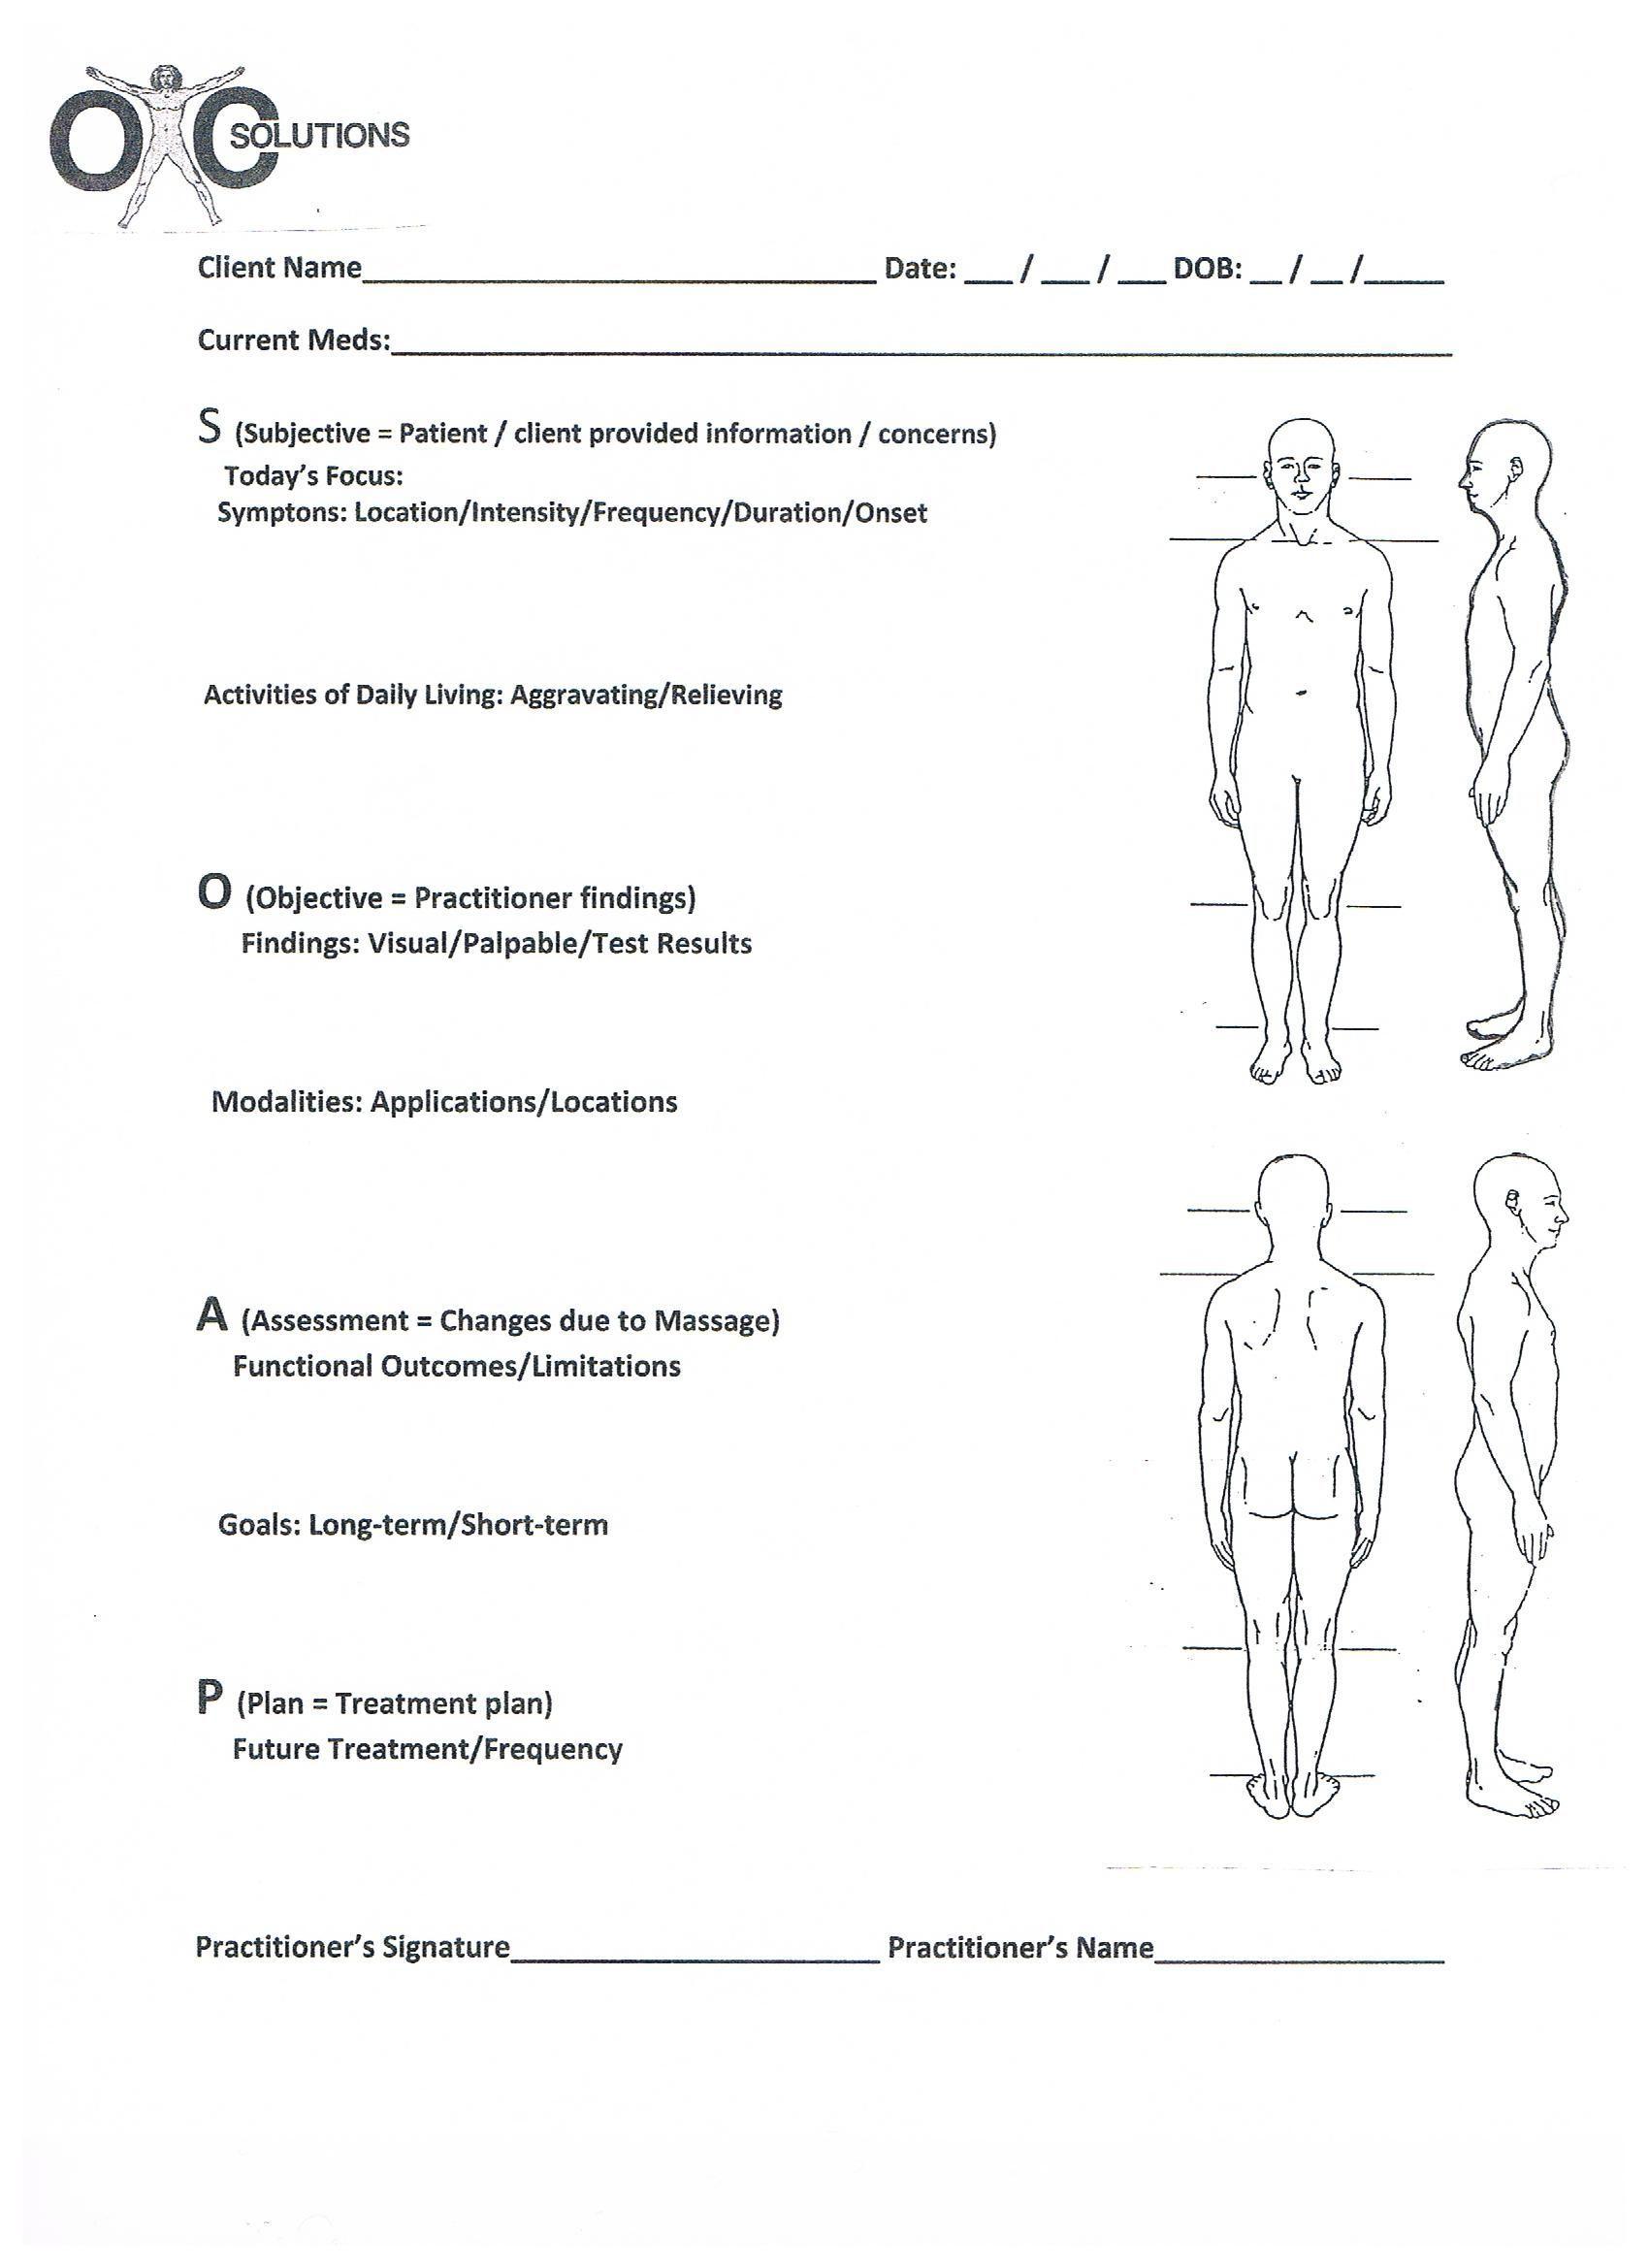 medium resolution of soap chart massage pinterest massage therapy massage and therapy rh pinterest com body diagram for massage